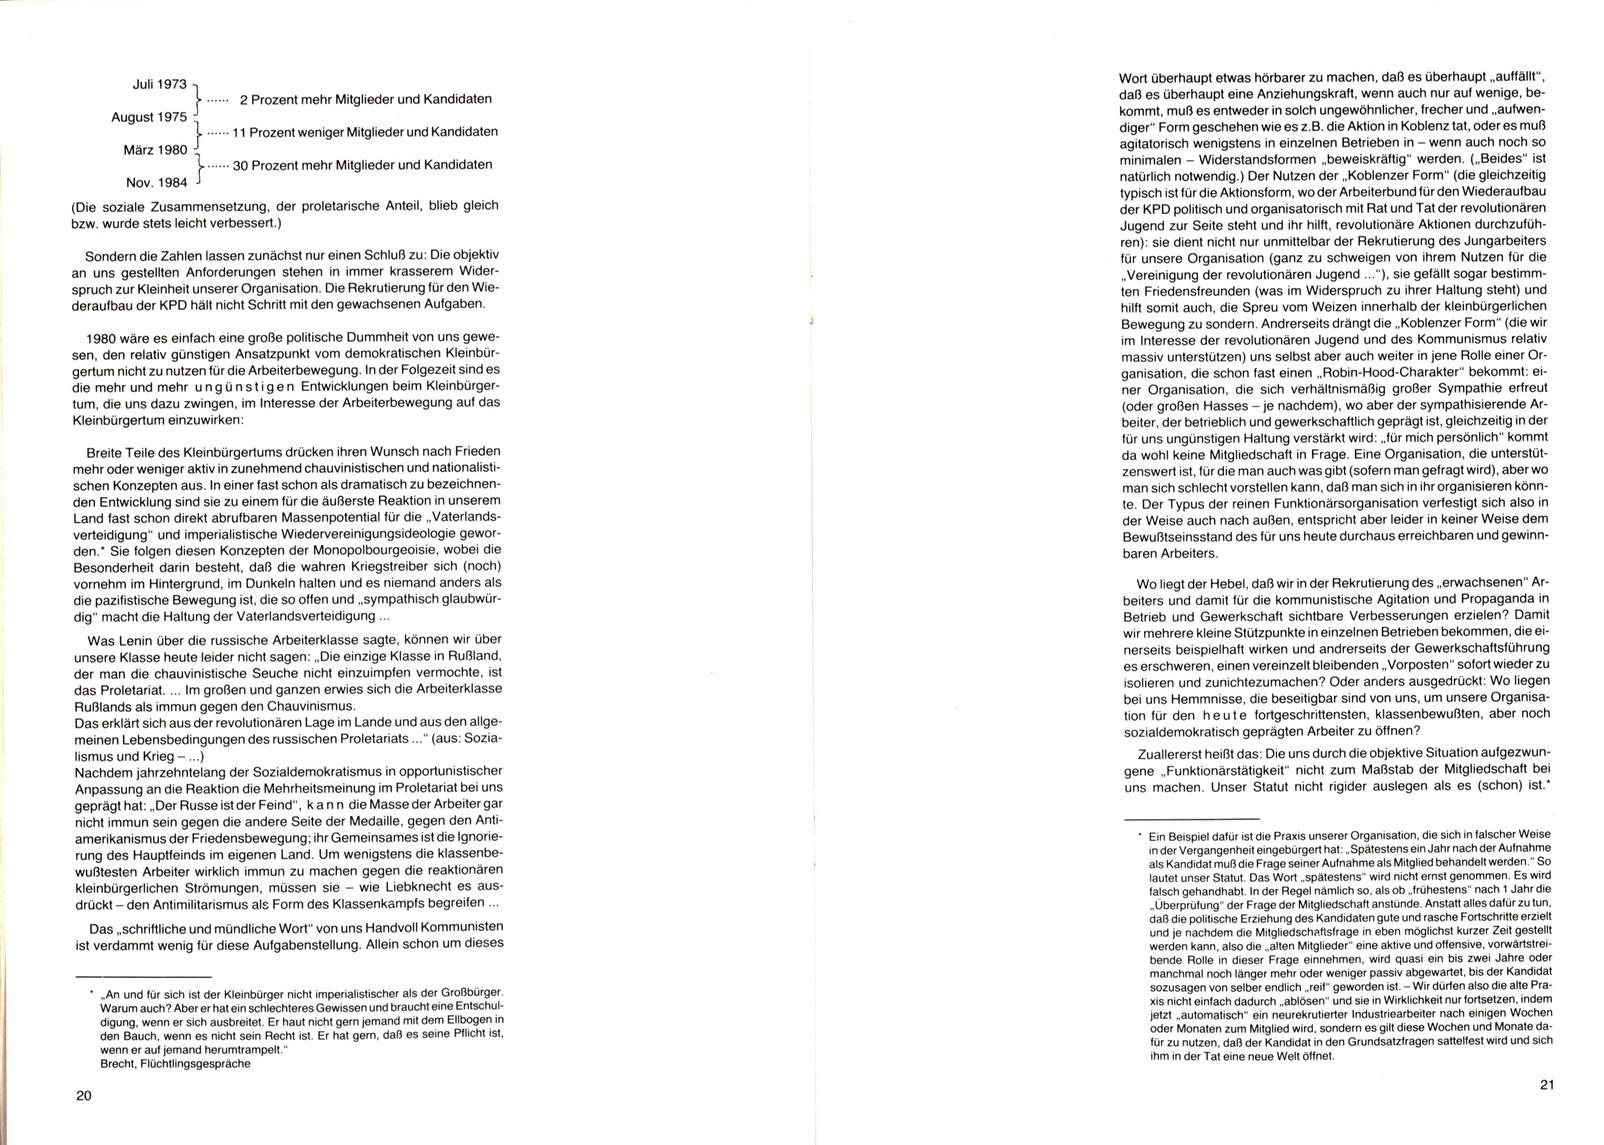 ABG_1985_Beschluesse_IV_Delegiertenkonferenz_12